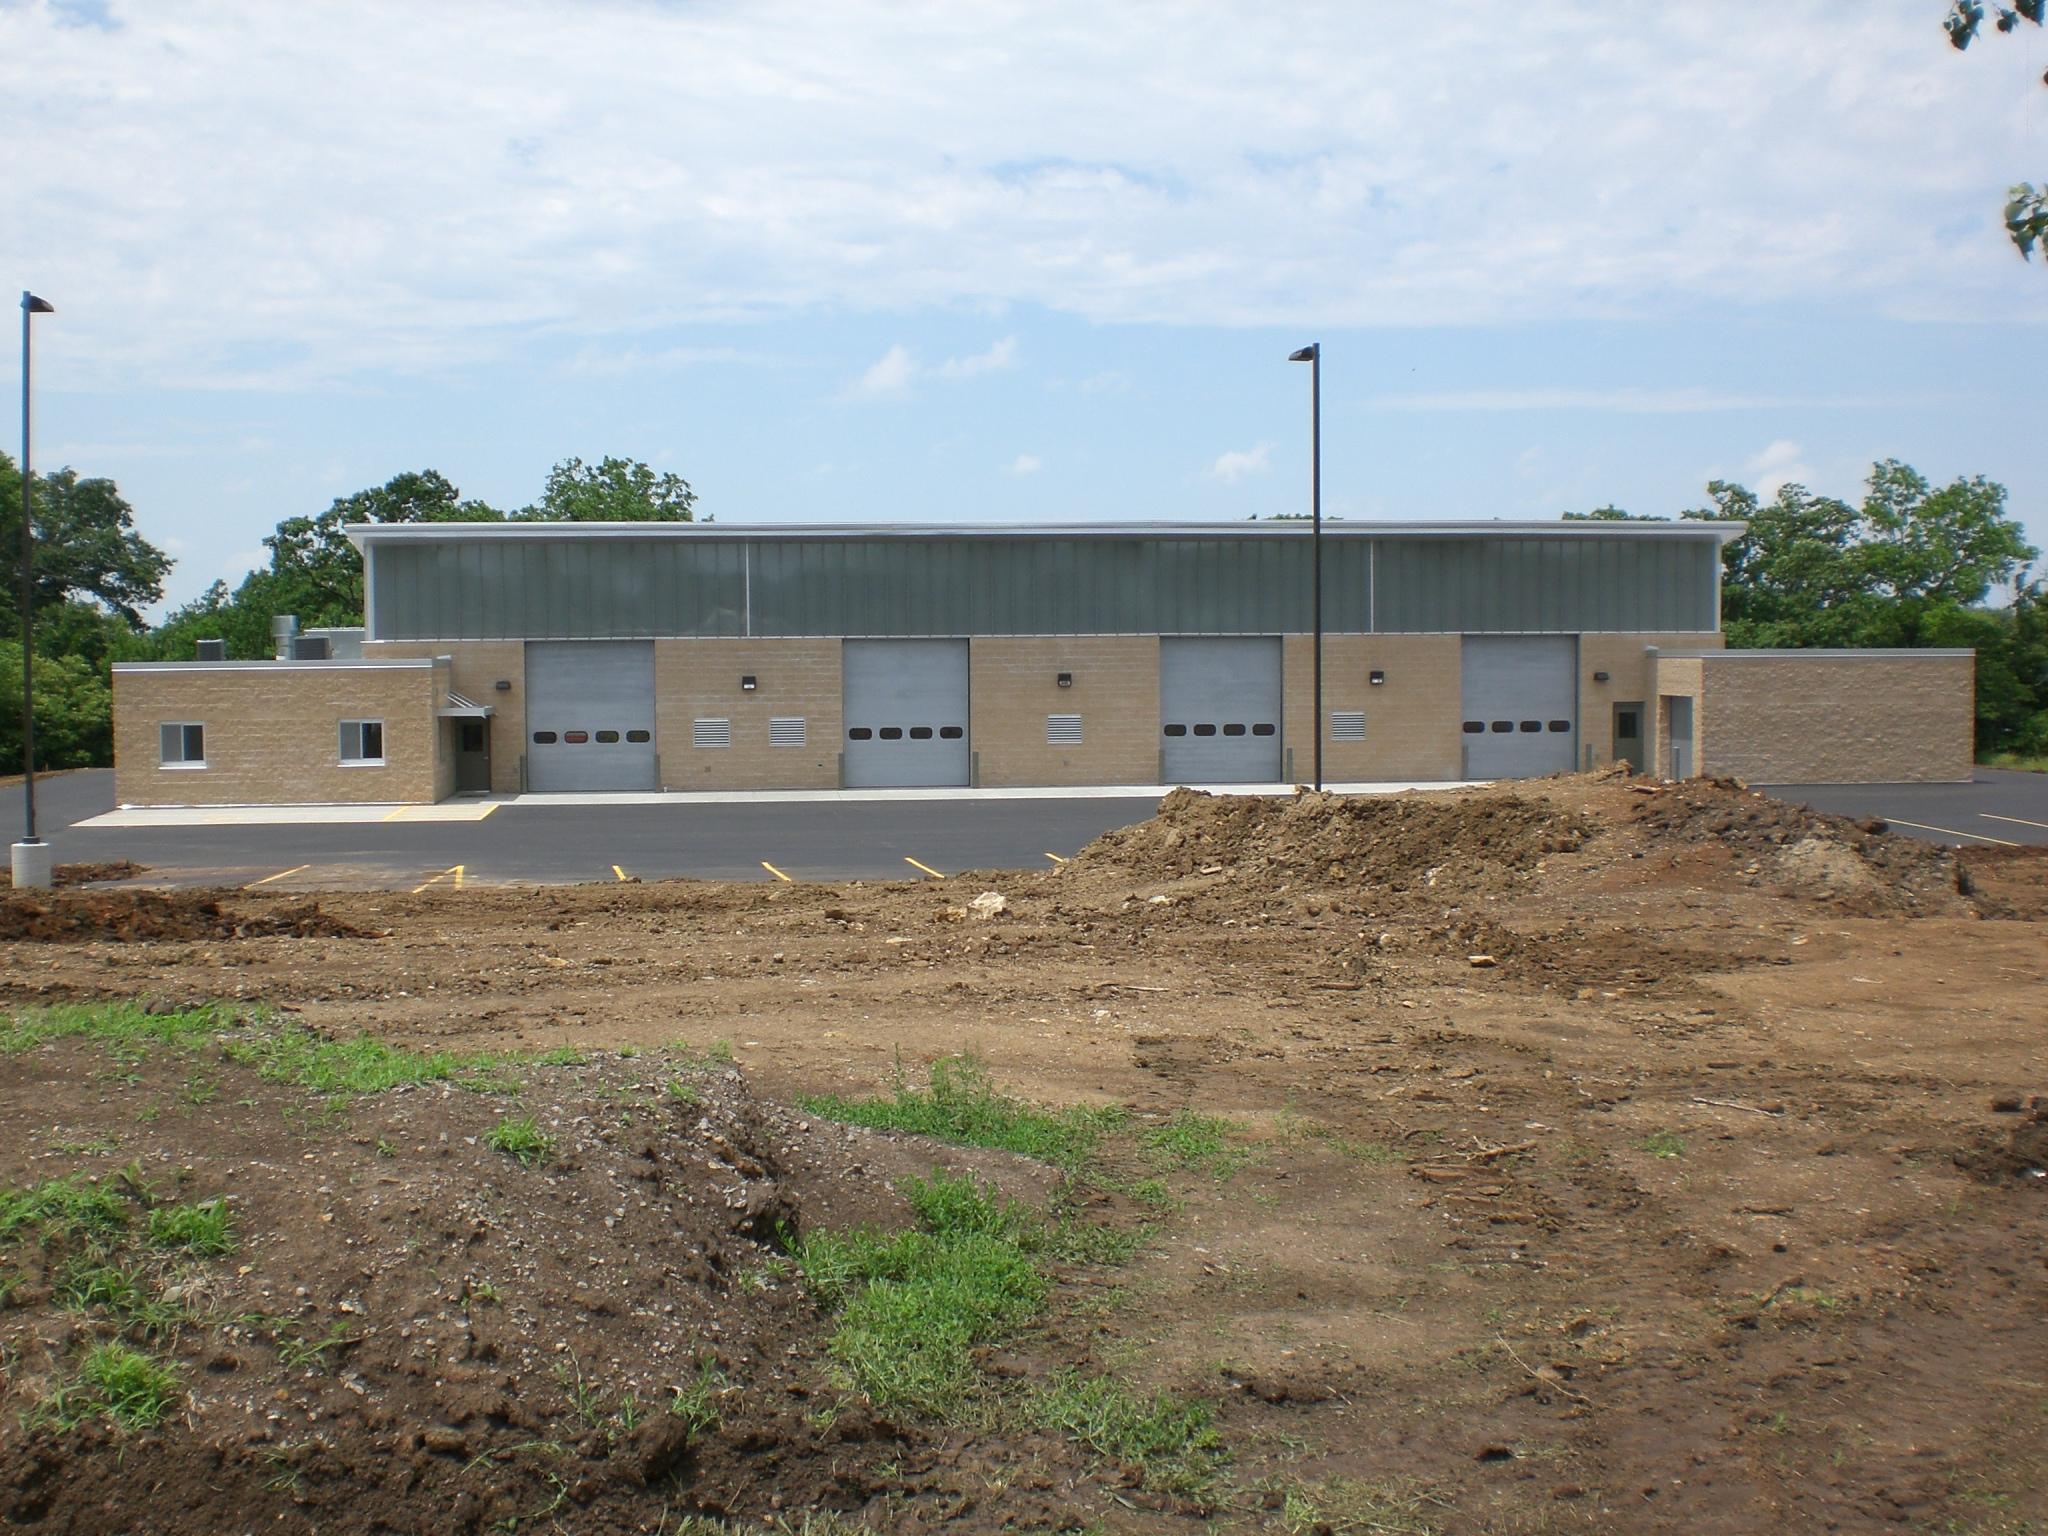 Shawnee County Golf Course Maintenance Facility   Client: Lake Shawnee Golf Course Architect: HTK Architects